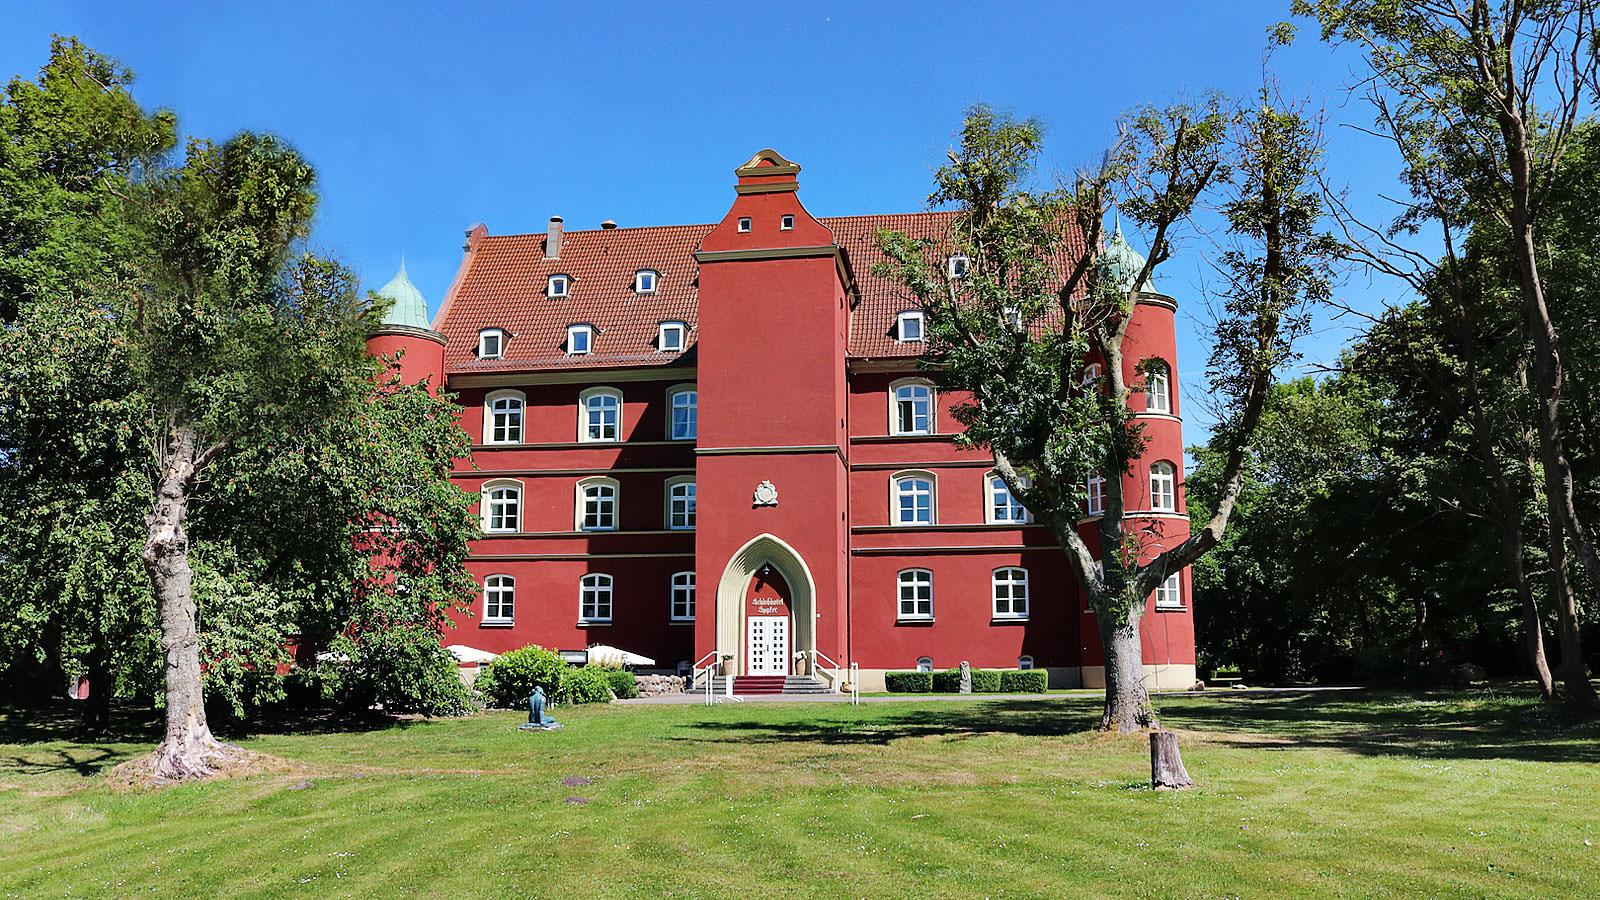 Hof vor dem Hotel Schloss Spyker am Jasmunder Bodden auf der Insel Rügen